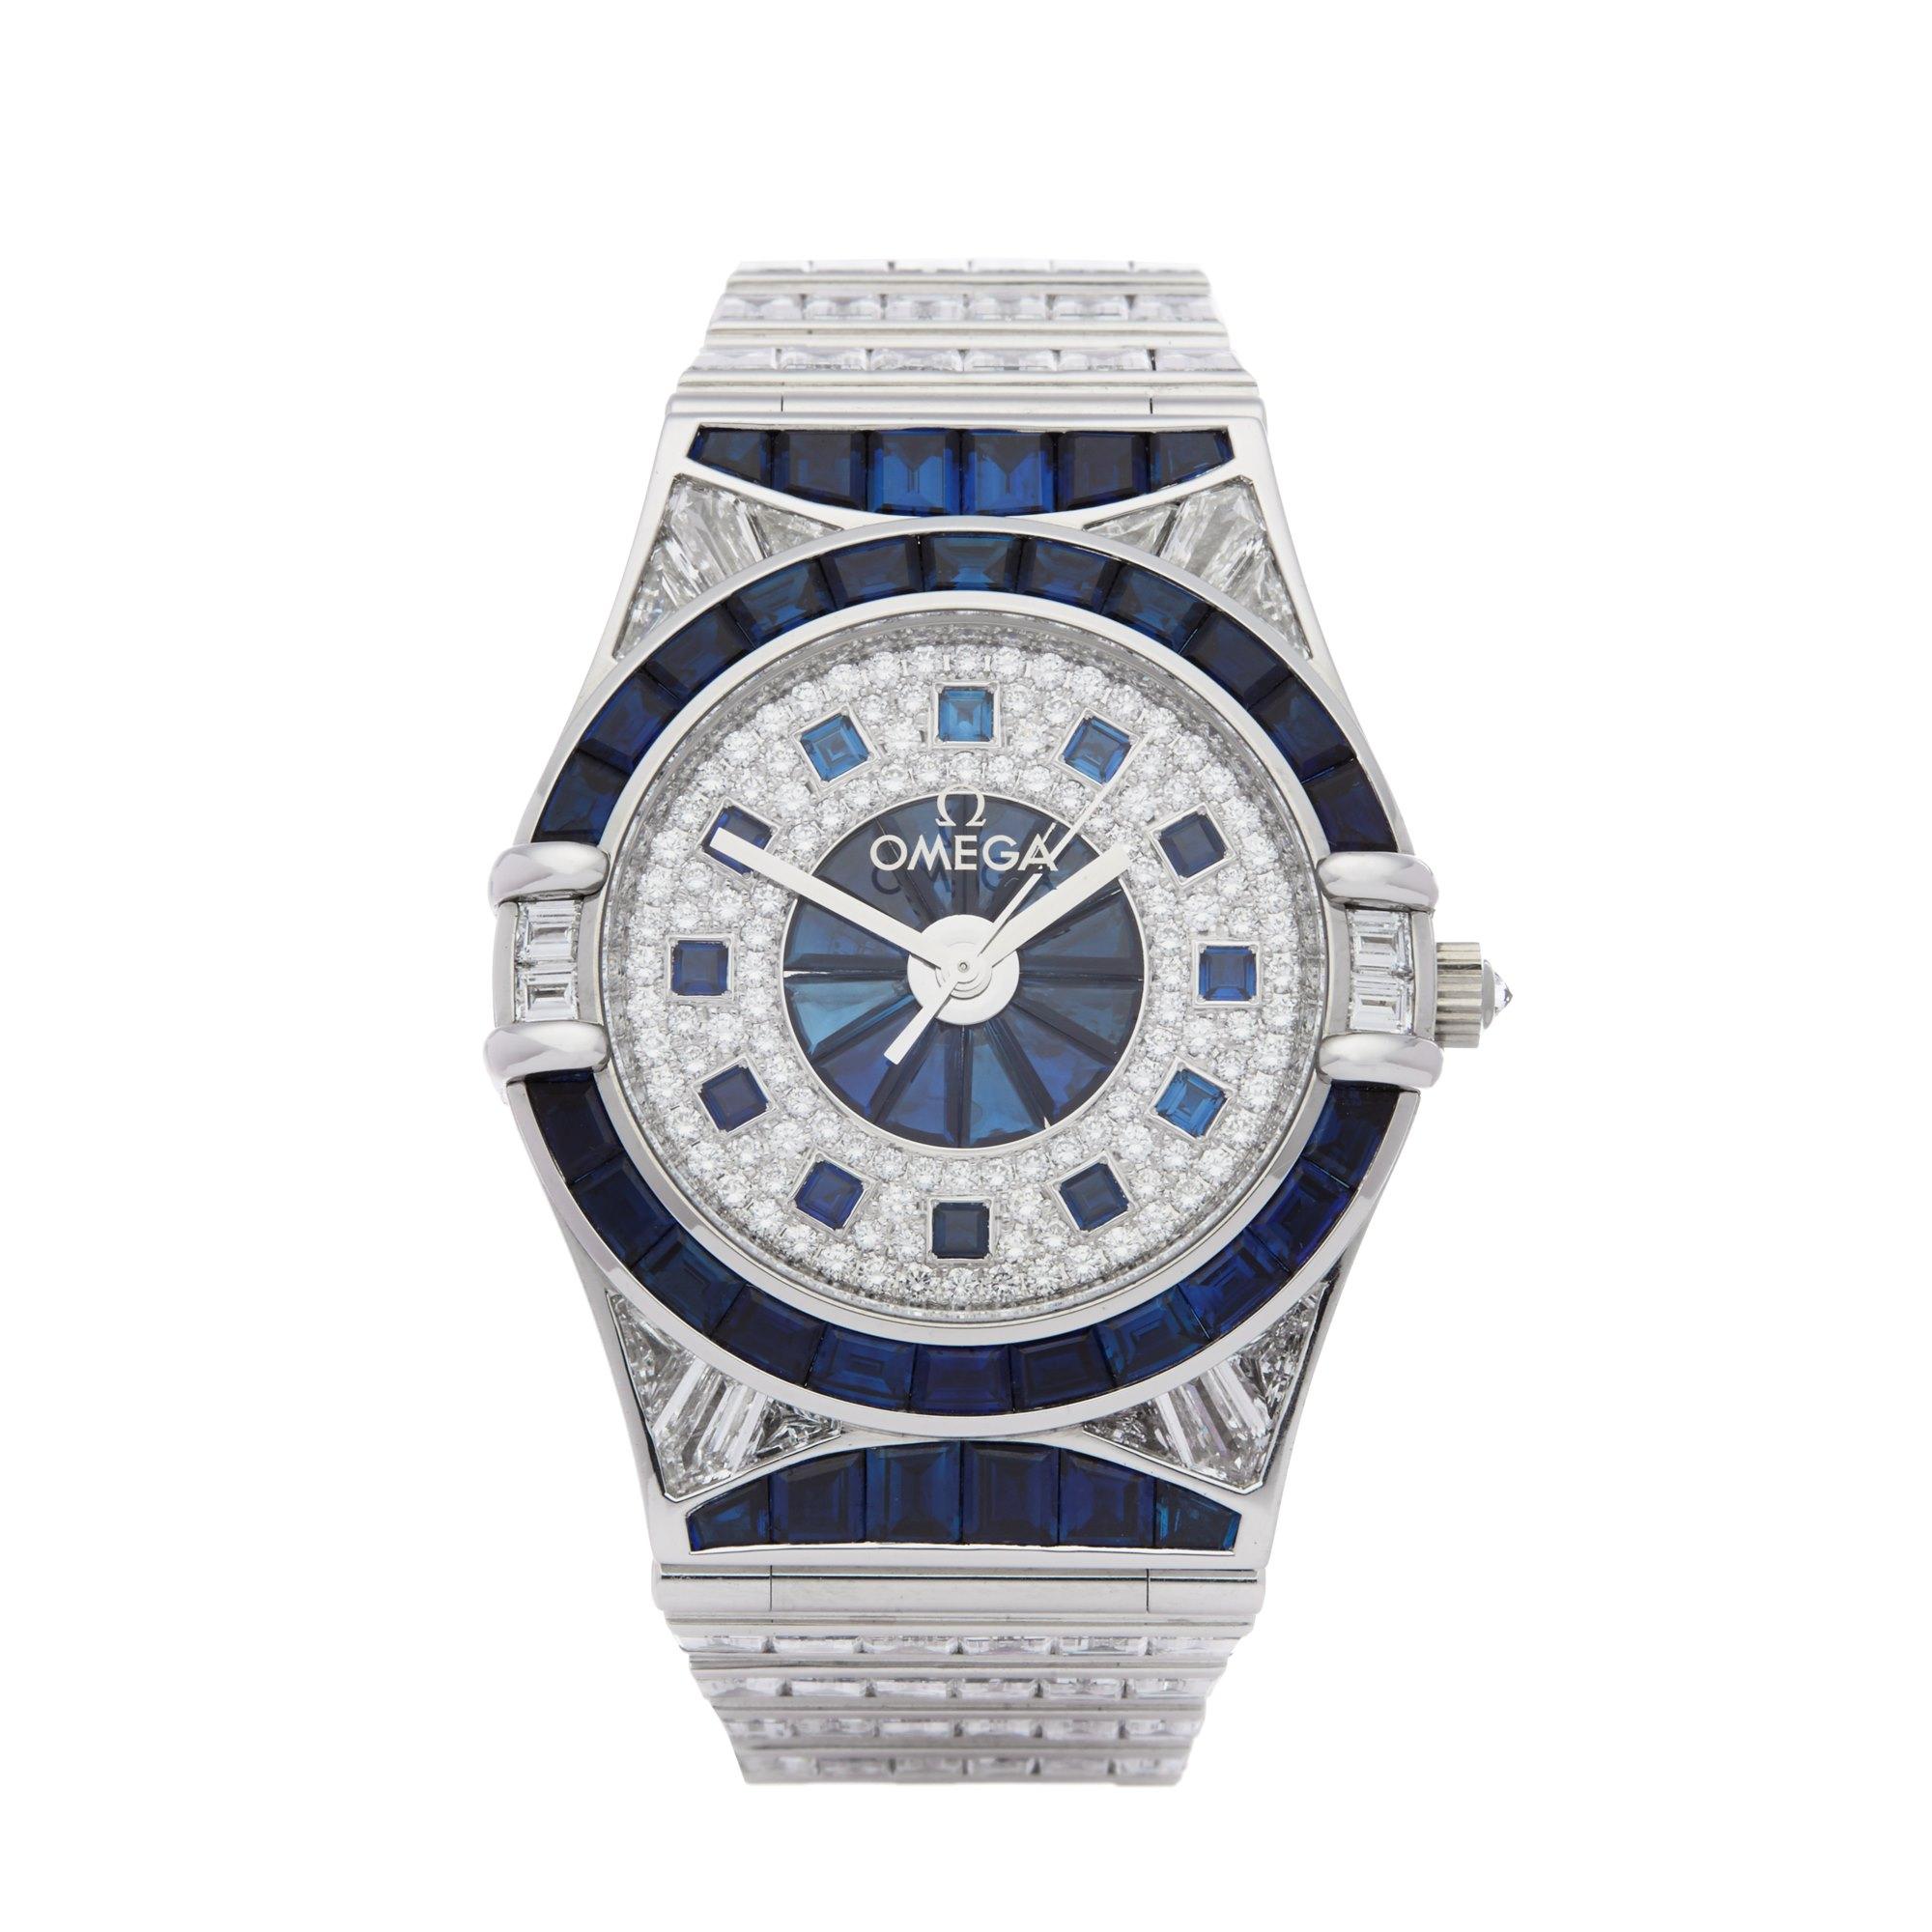 Omega Constellation Diamond & Sapphire 18K White Gold Piece Unique